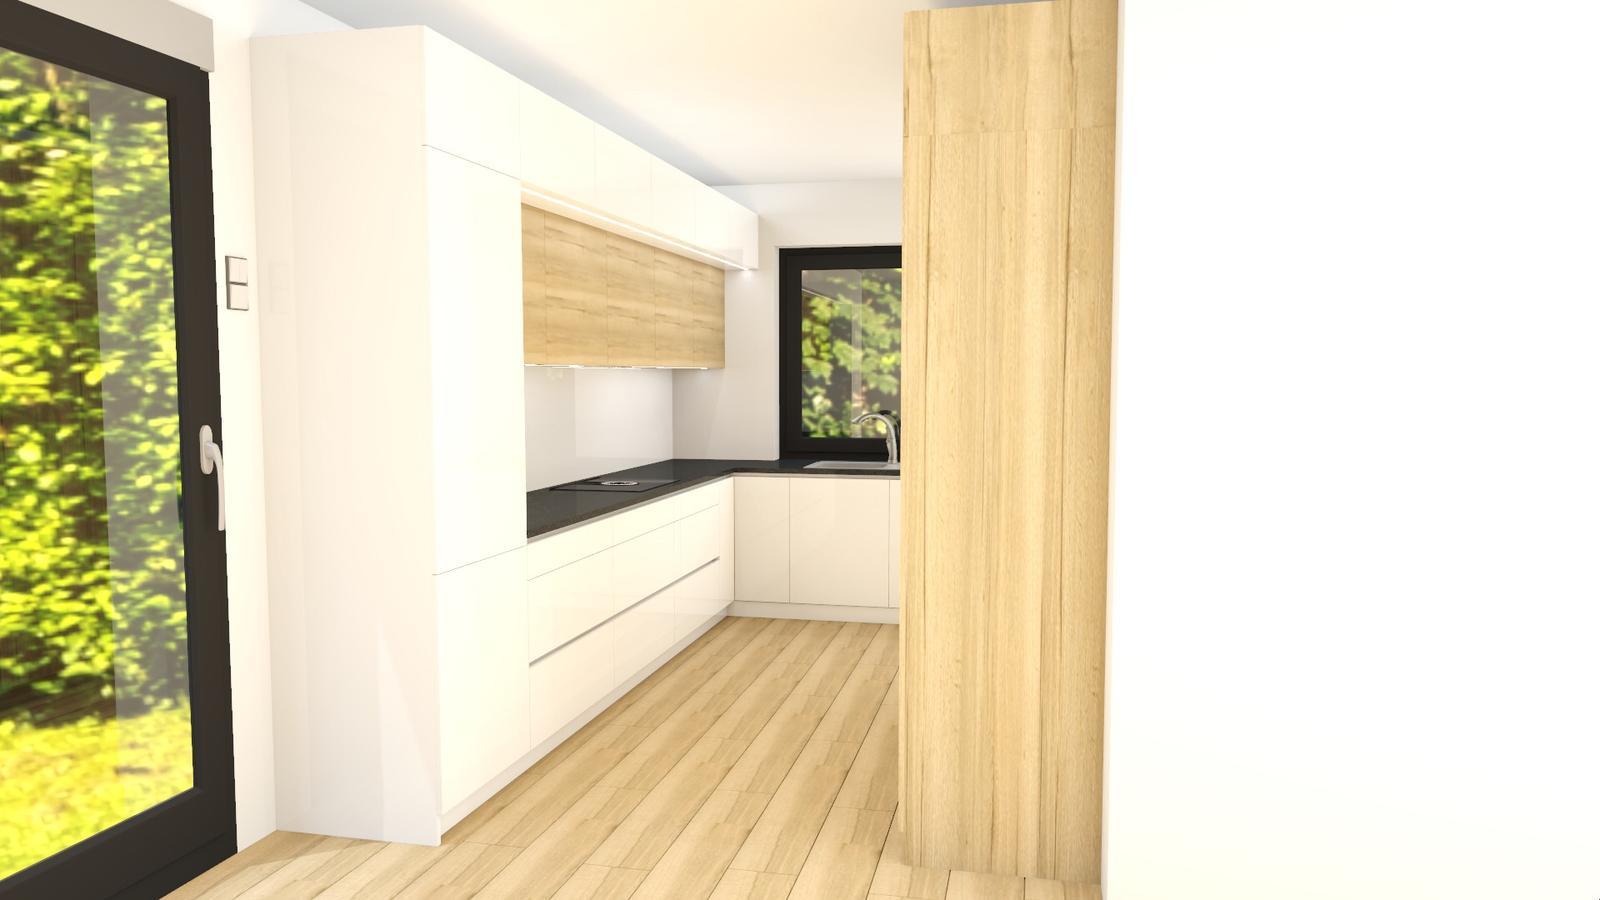 Navrh kuchyne - konecna verzia kuchyne, uf